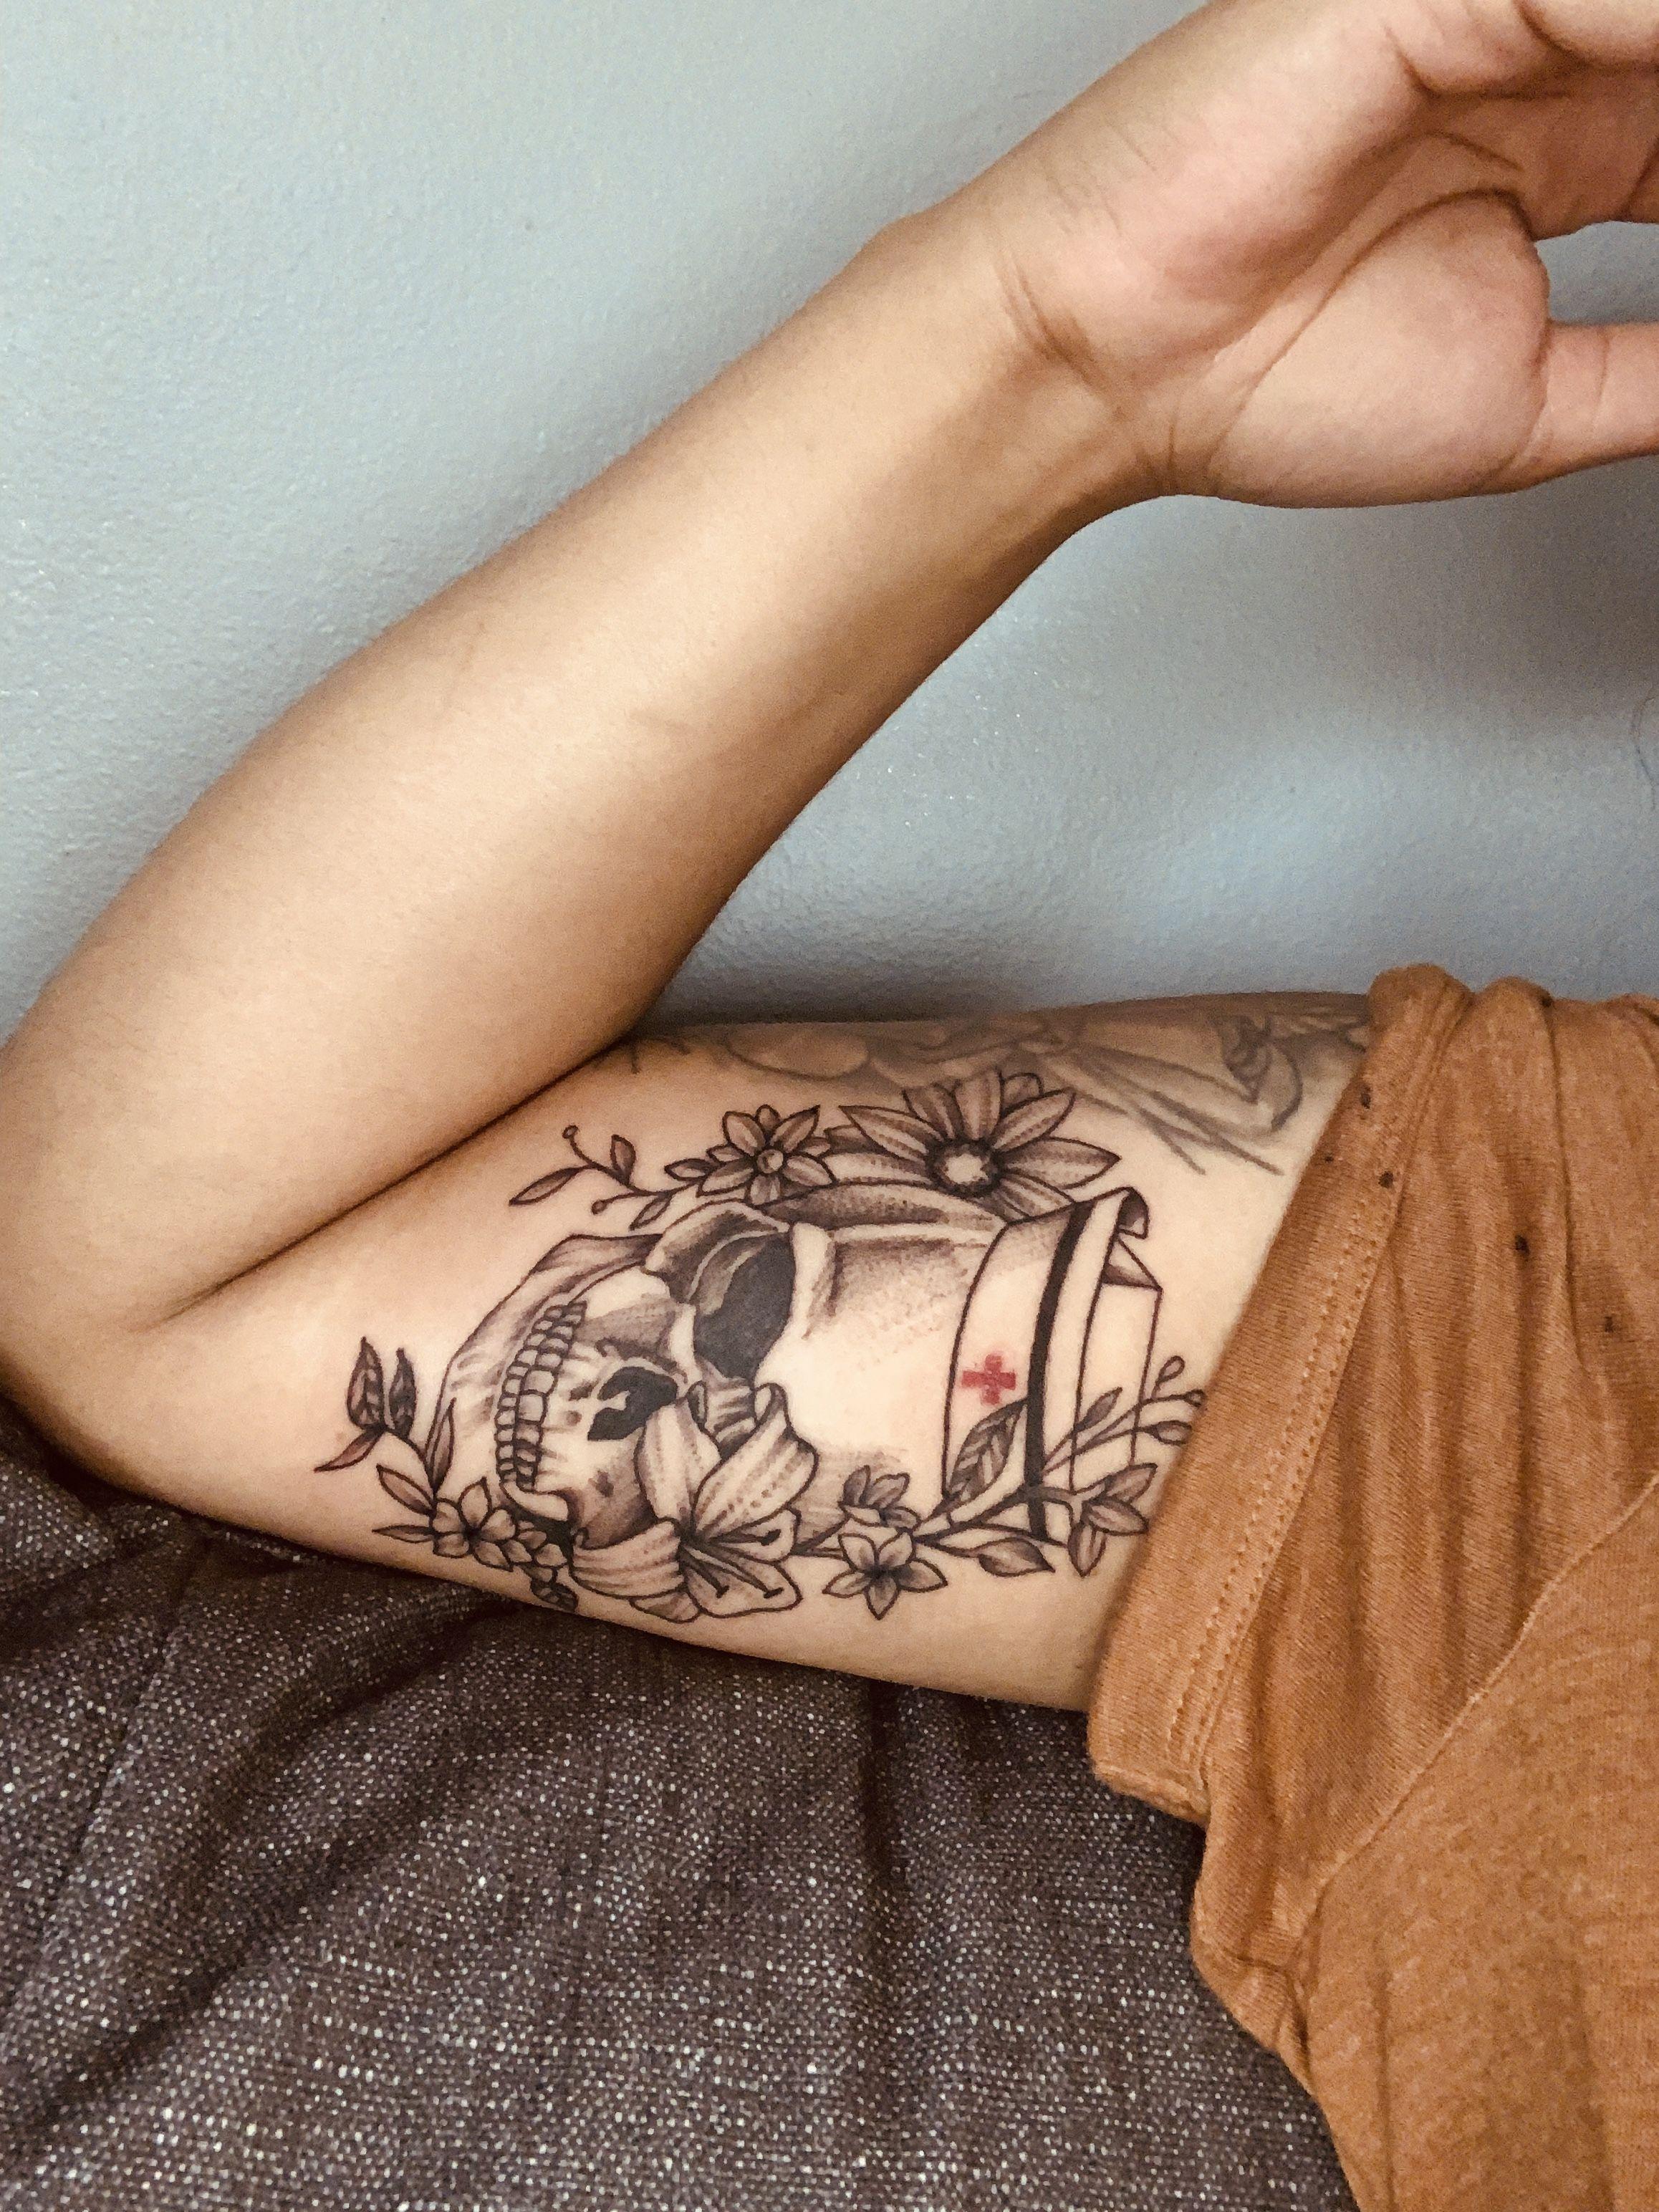 Nurse Tattoo Sleeve : nurse, tattoo, sleeve, Nurse, Tattoo, Tattoo,, Tattoos,, Sleeve, Tattoos, Women